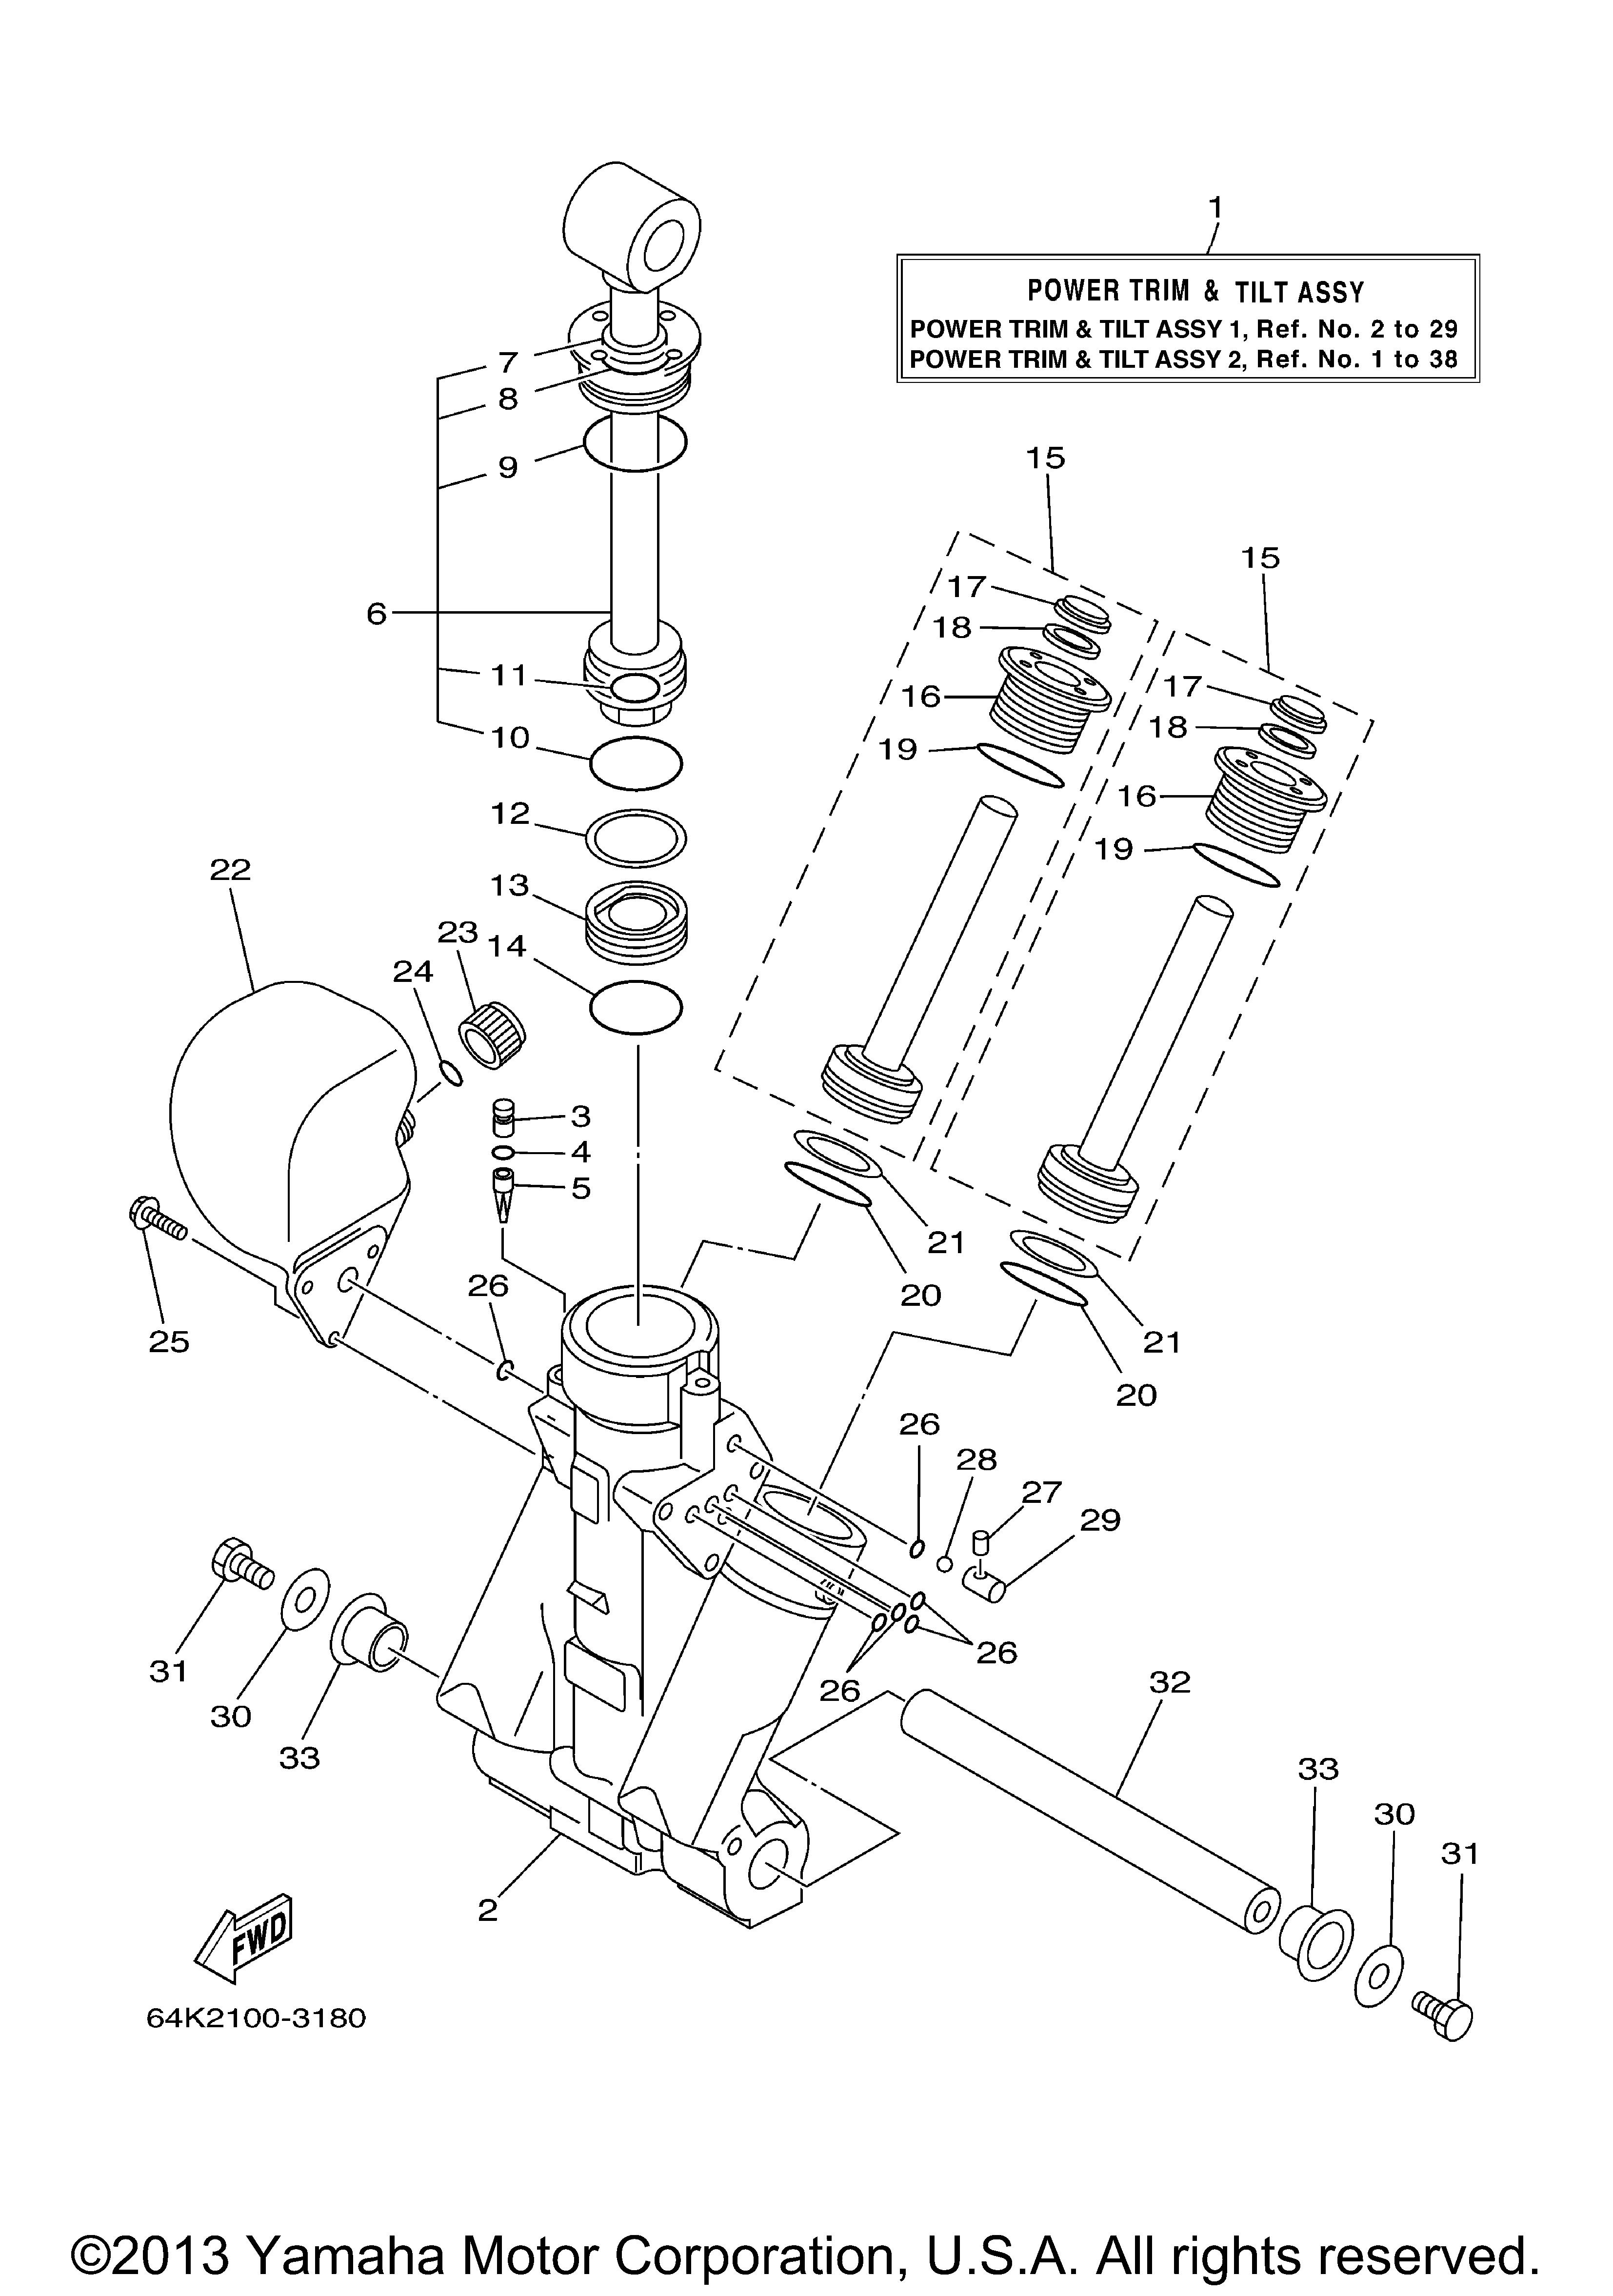 Yamaha | OUTBOARD | VZ225TLRC 250TLRC | POWER TRIM TILT ASSY 1 ...